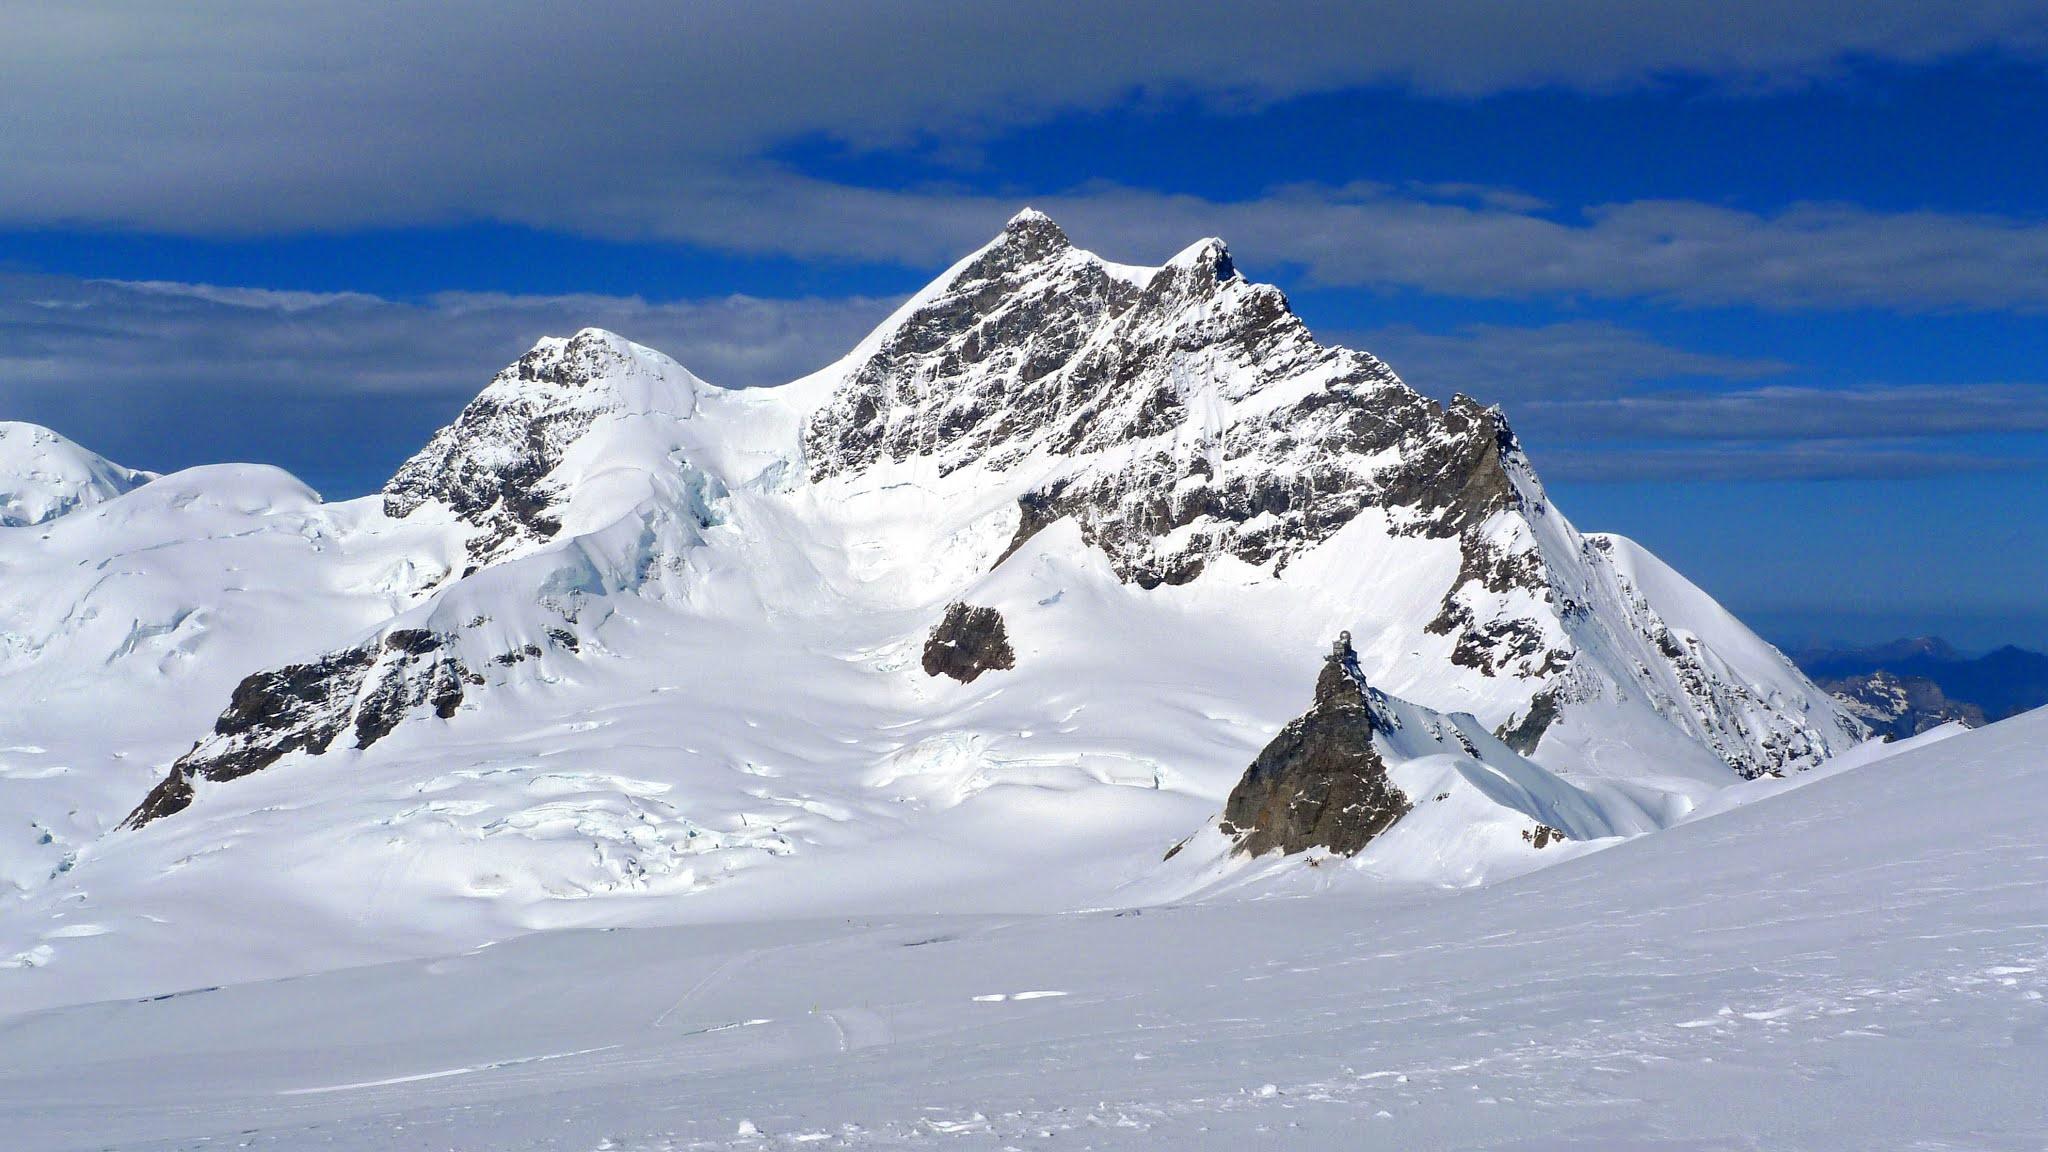 горы Гамбурцева в Антарктиде